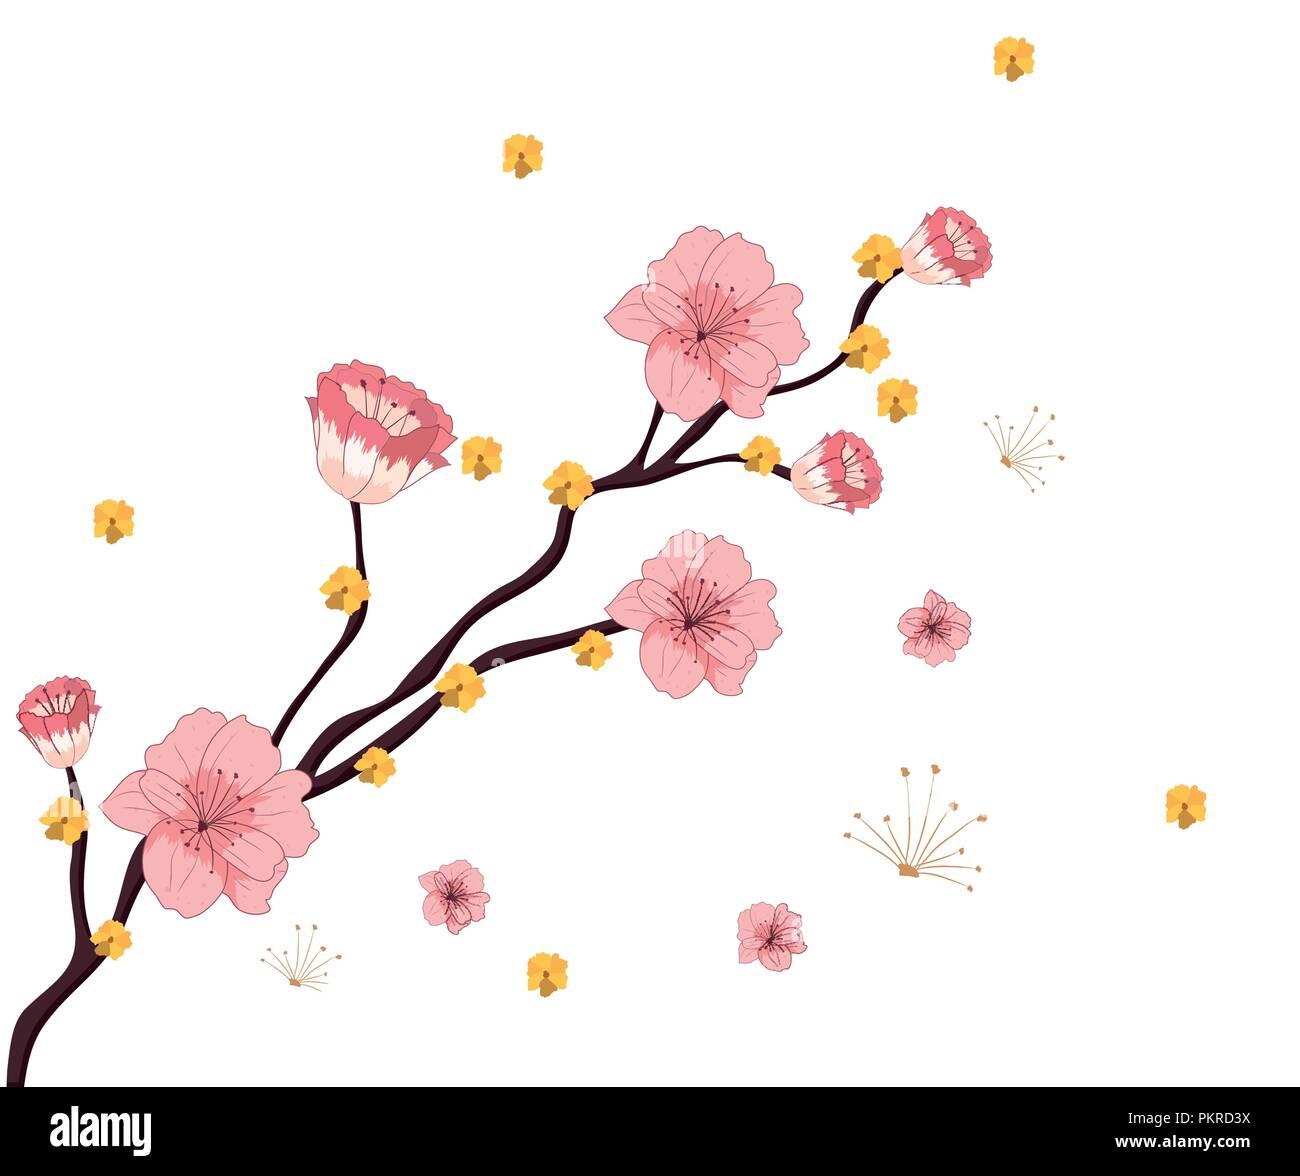 Rosa Blume Muster Hintergrund Stockbild